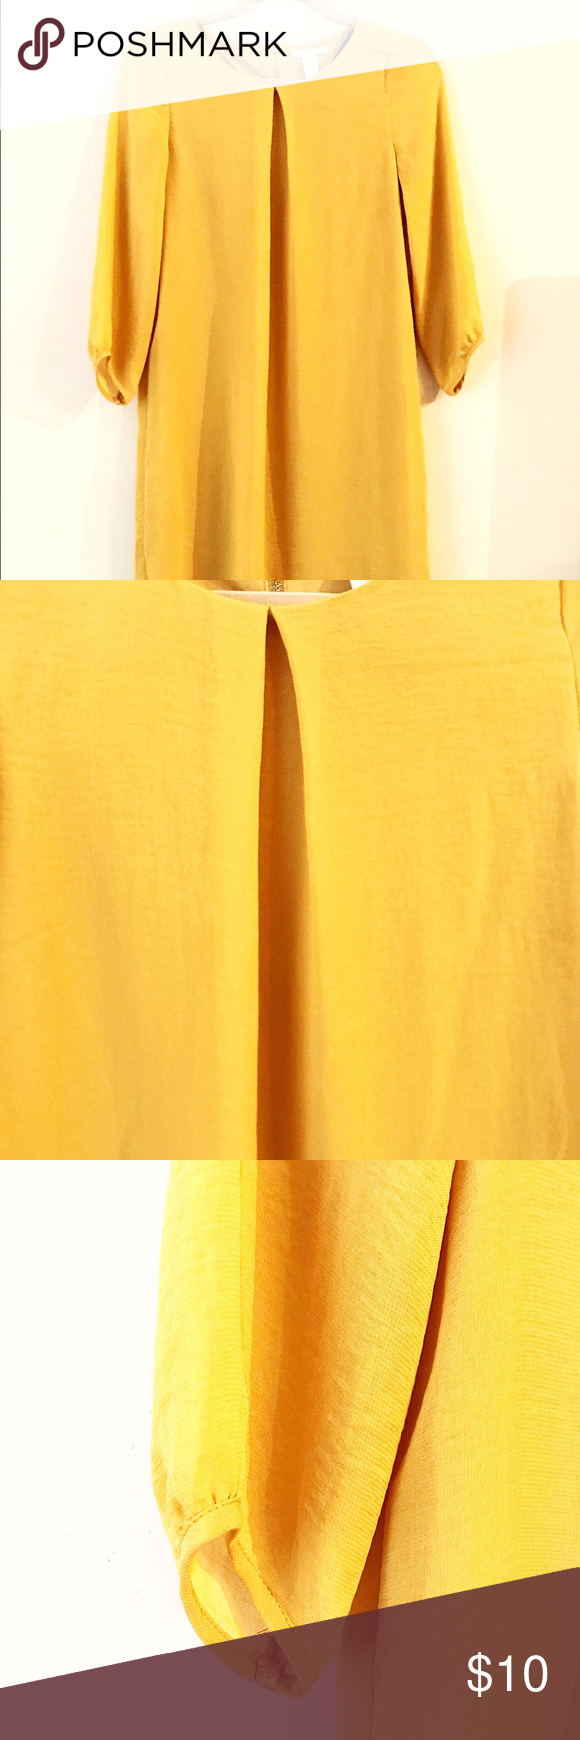 Yellow dress knee length  Knee length mustard yellow dress Worn once This dress is a box